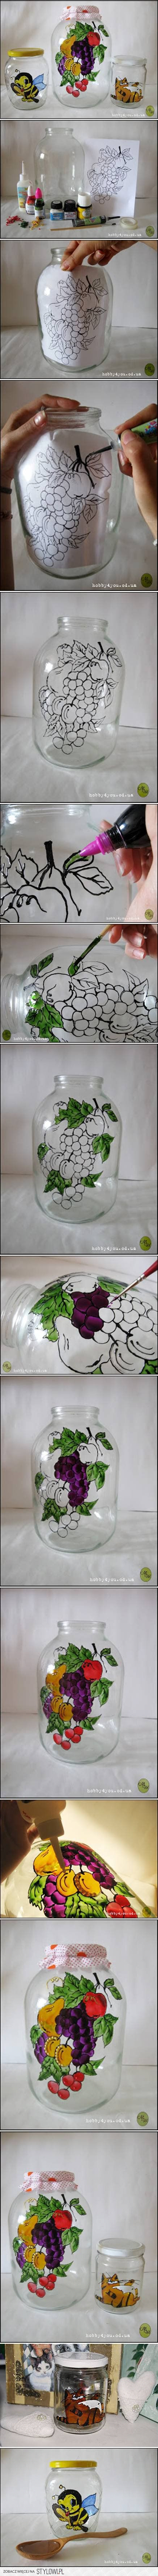 DIY Jar Painting Decor DIY Projects | UsefulDIY.com na Stylowi.pl